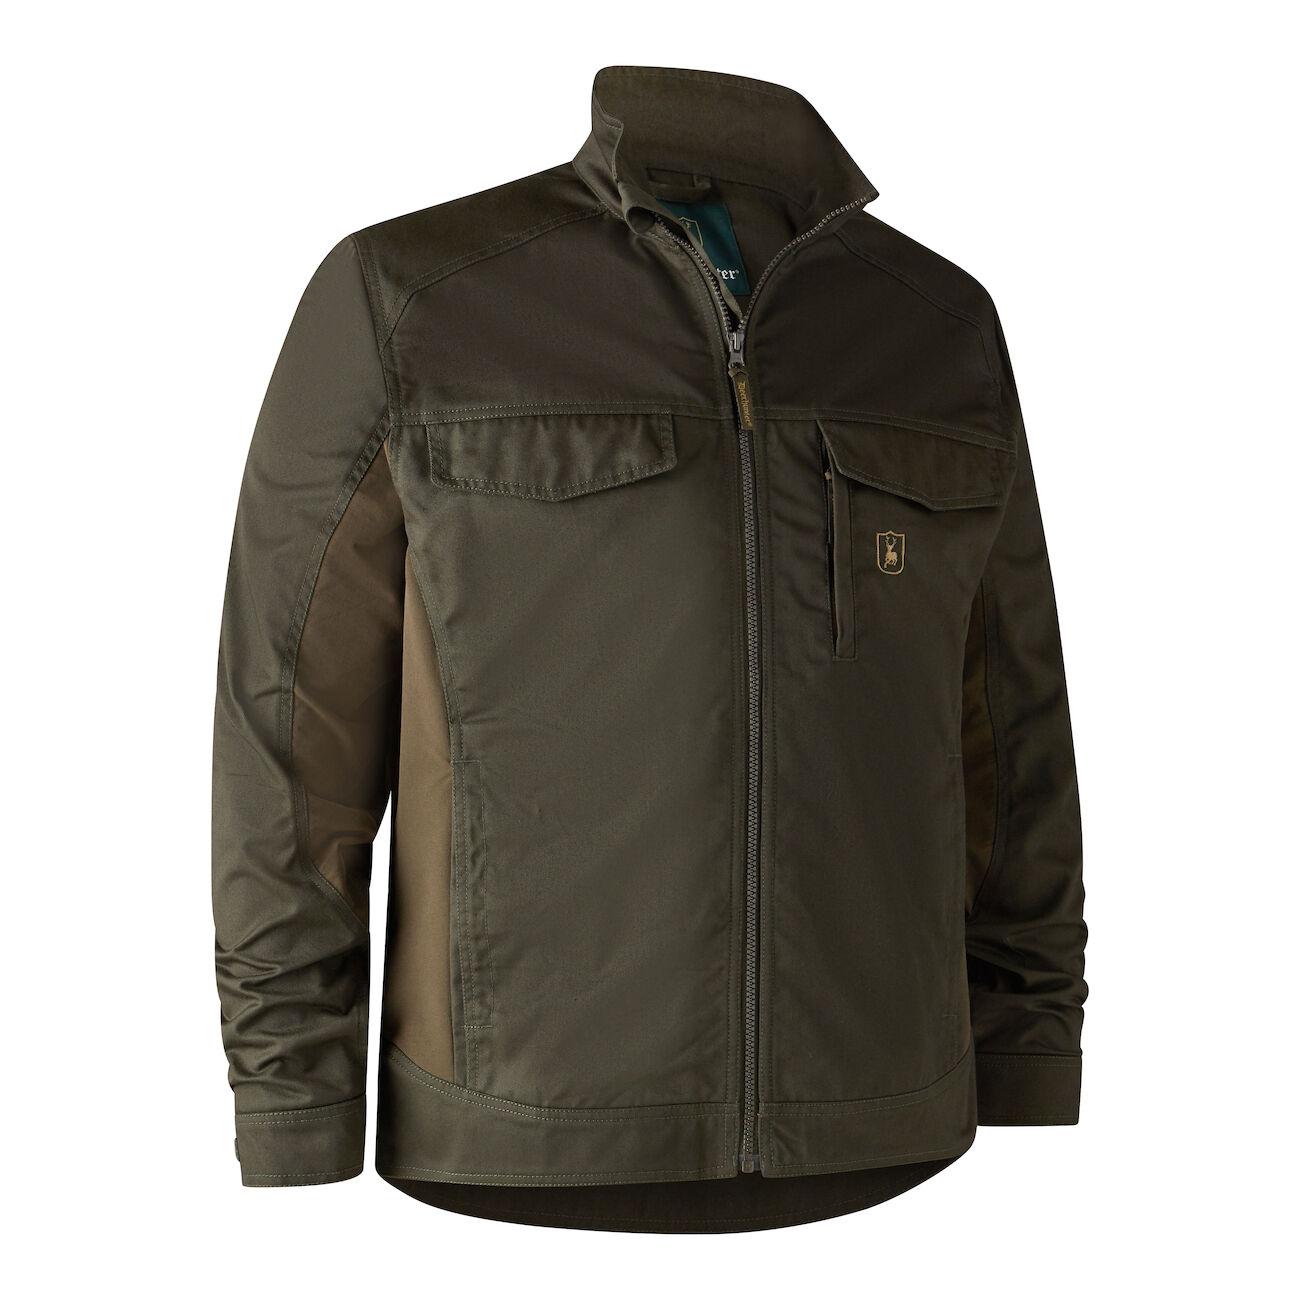 DEERHUNTER Rogaland Stretch Jacket